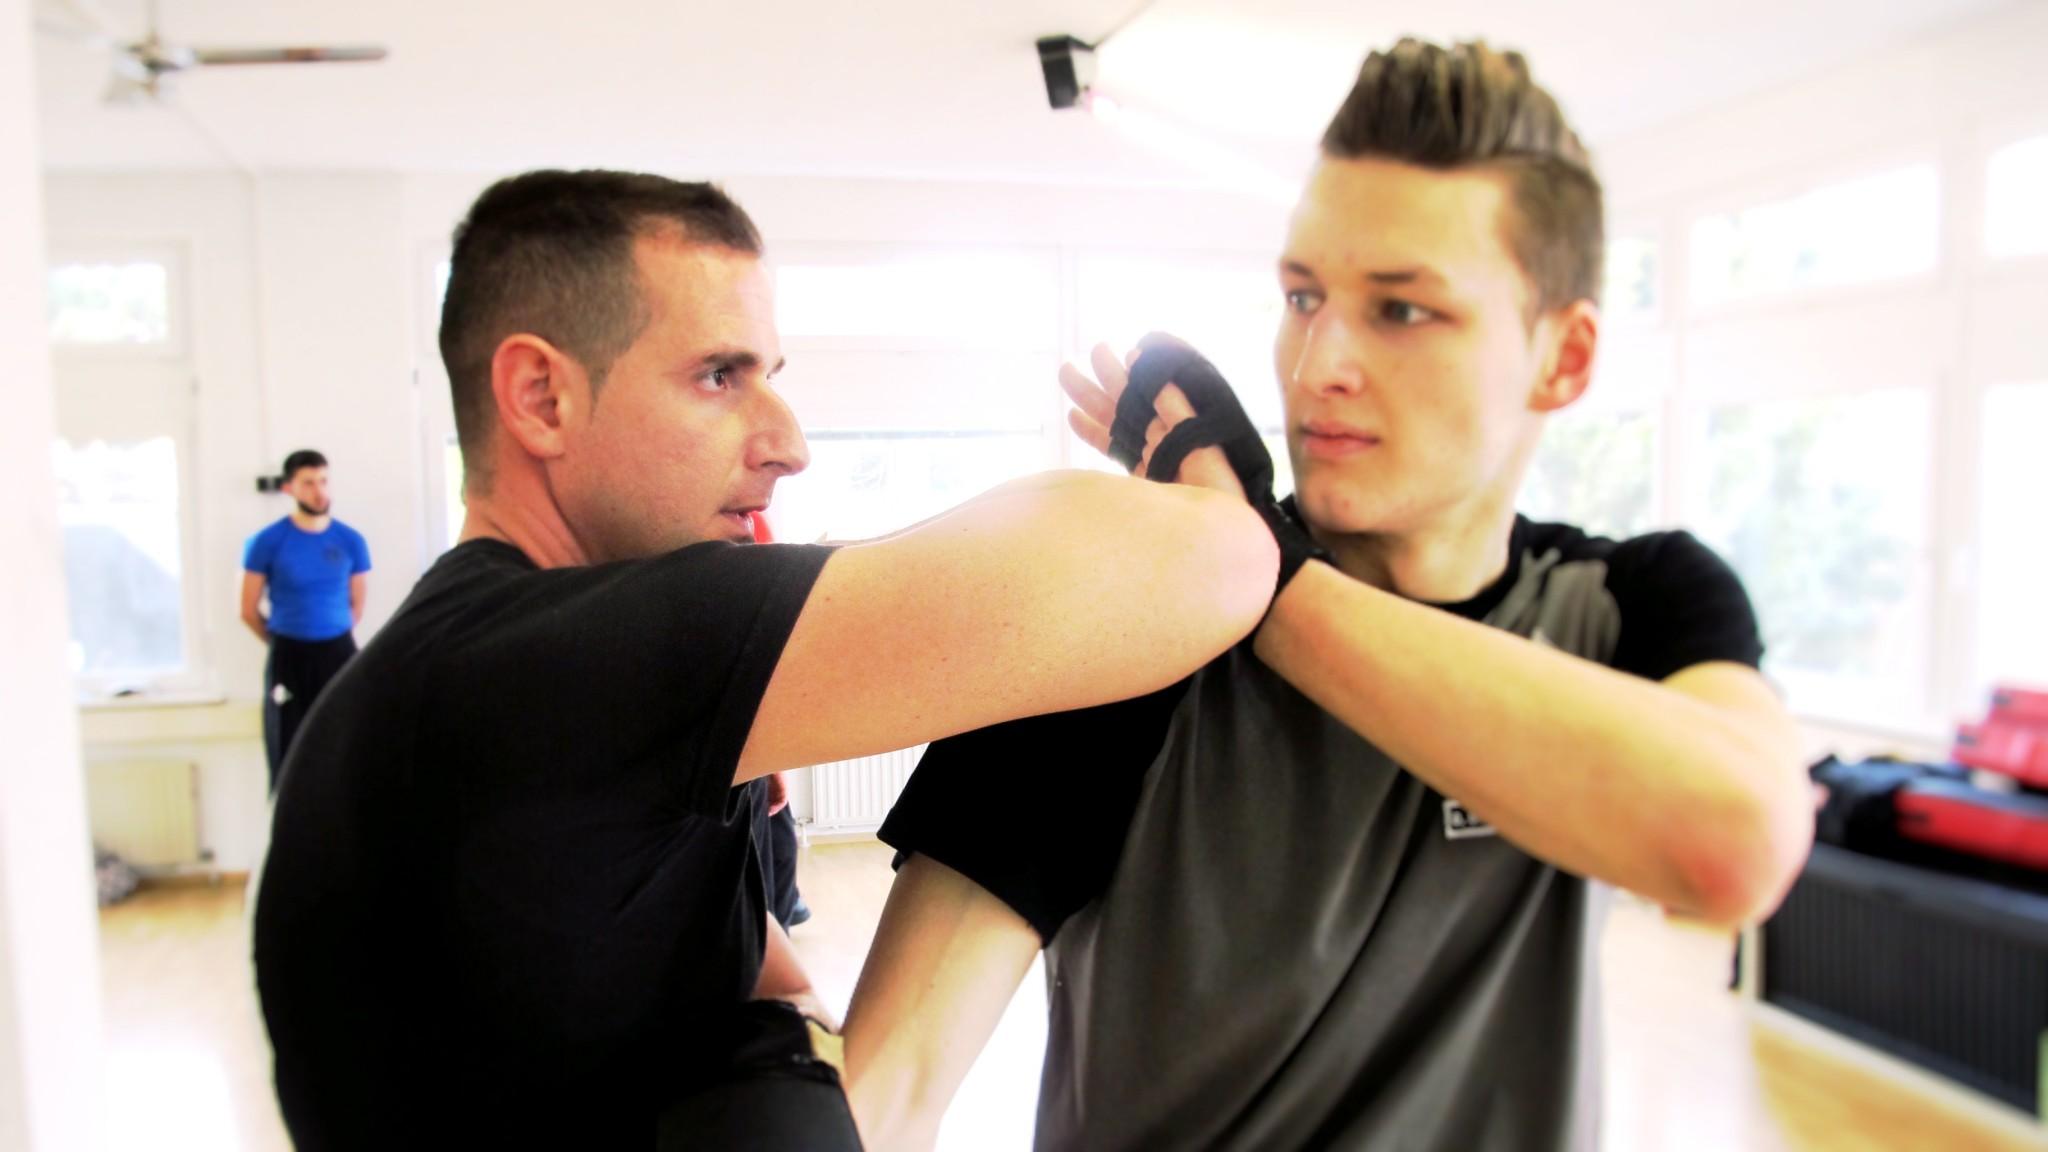 Stuttgart West, Wing Tsun, Selbstverteidigung, MMA Martial Arts, Krav Maga, Kampfsport